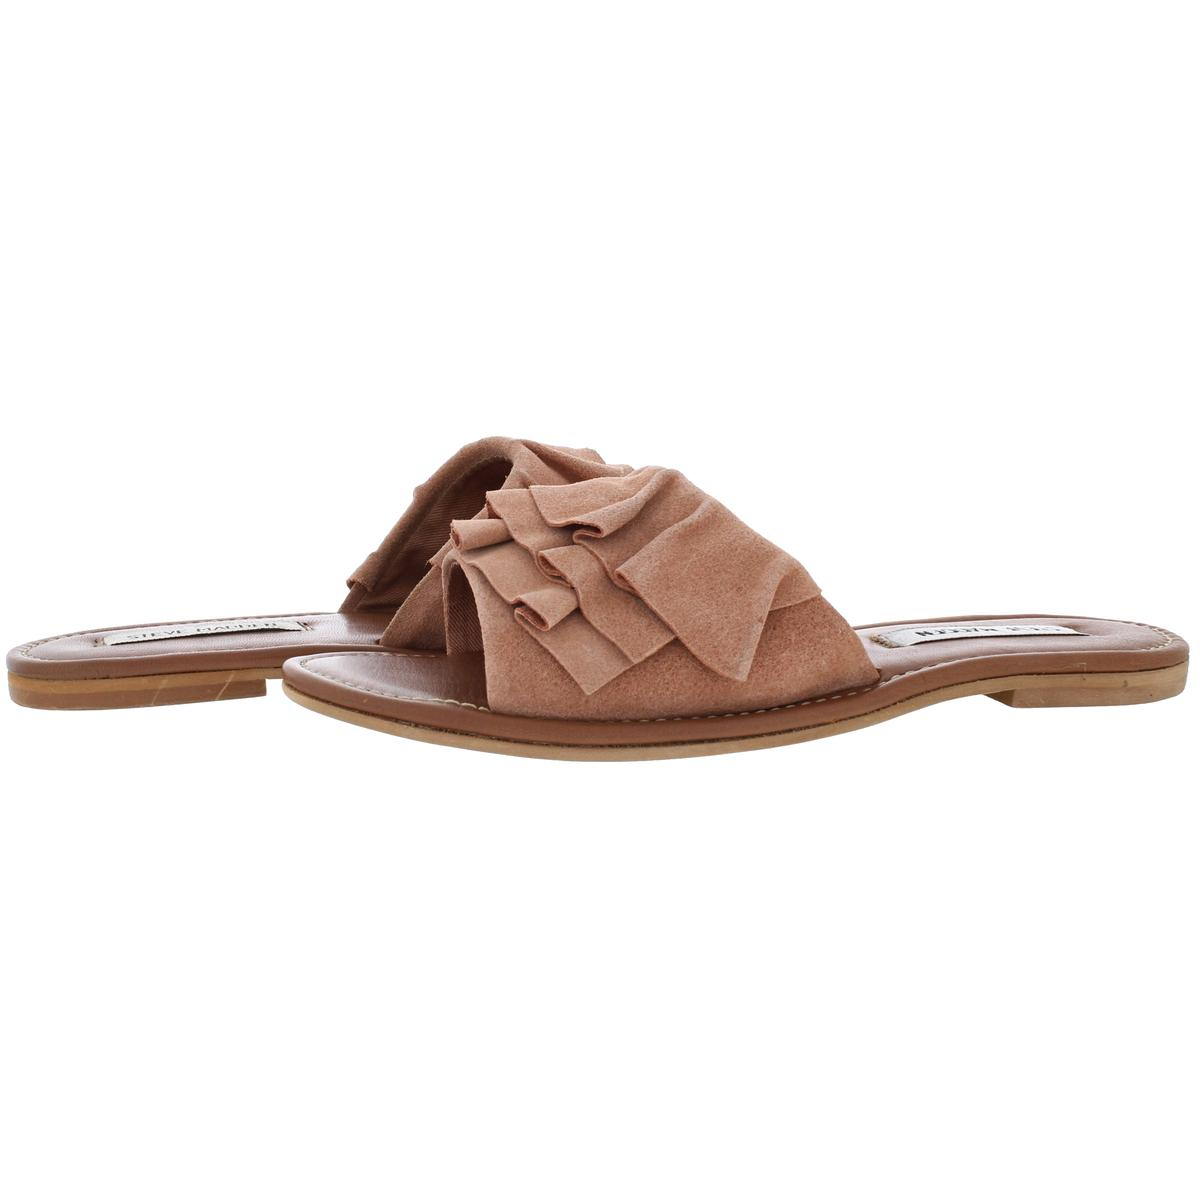 524842cdda6 Details about Steve Madden Women's Getdown Suede Slip On Ruffled Flat Sandal